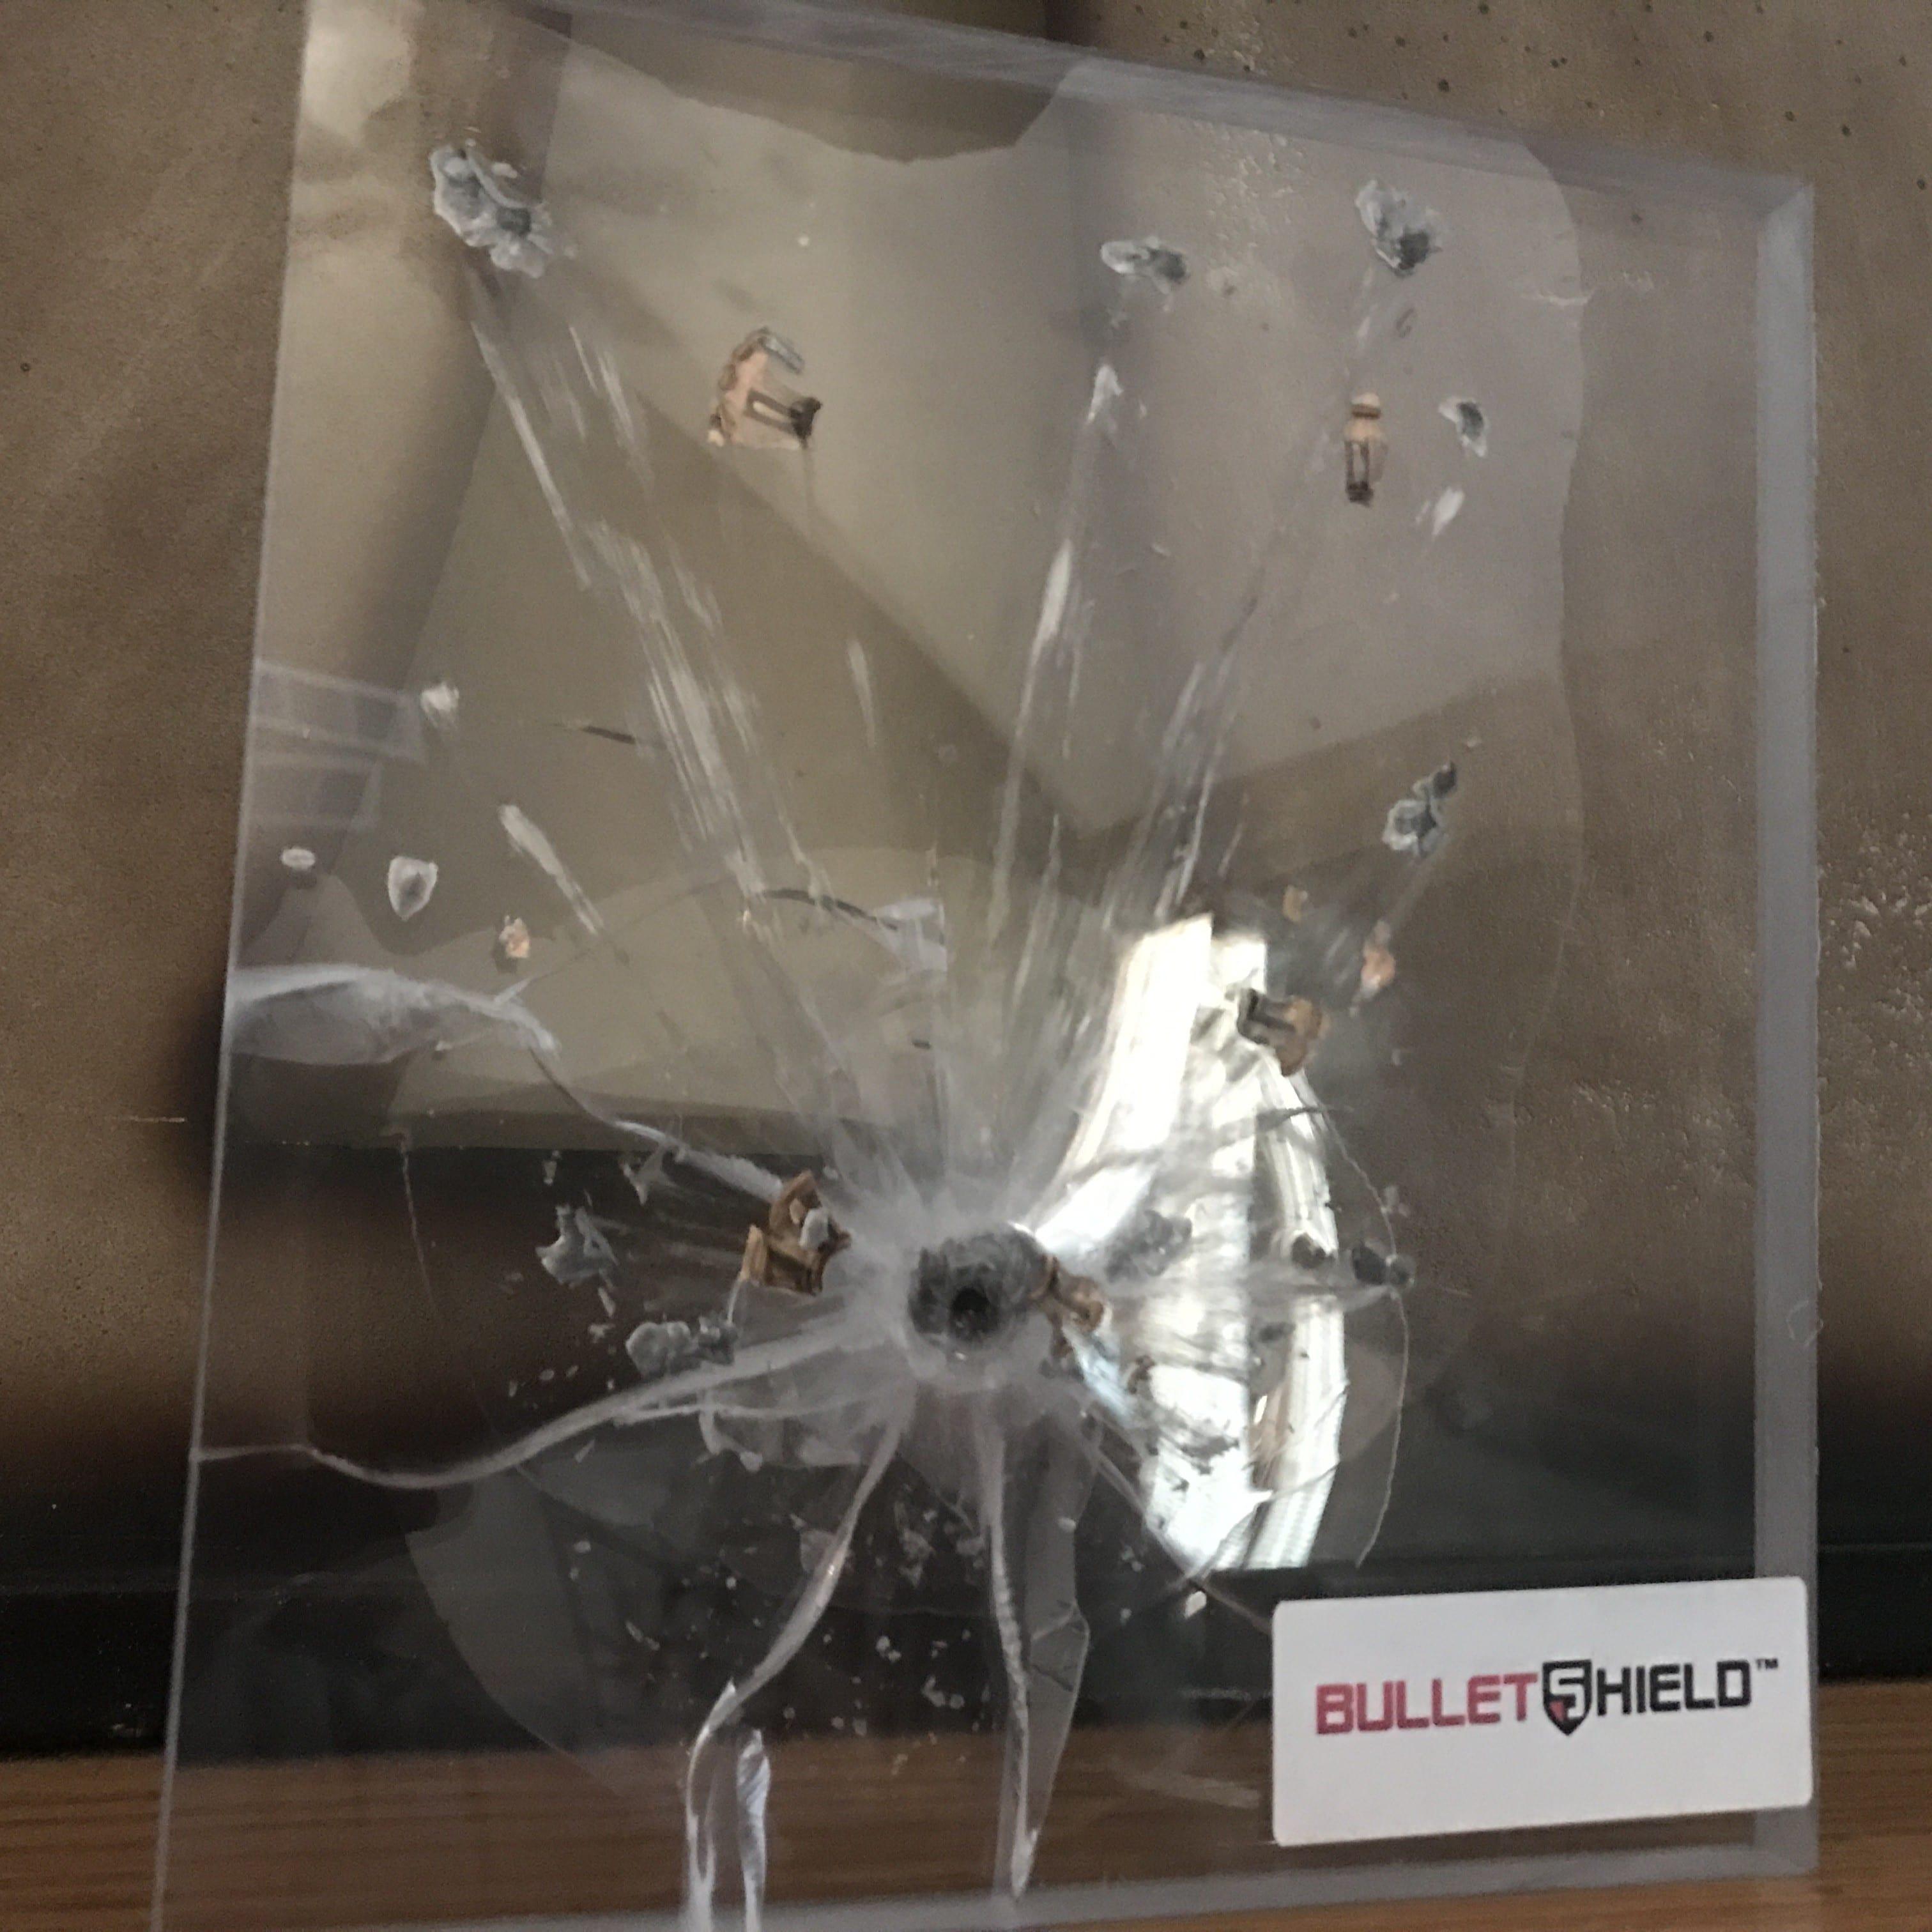 defenselite bulletshield protective glass ballistic security glass. Black Bedroom Furniture Sets. Home Design Ideas